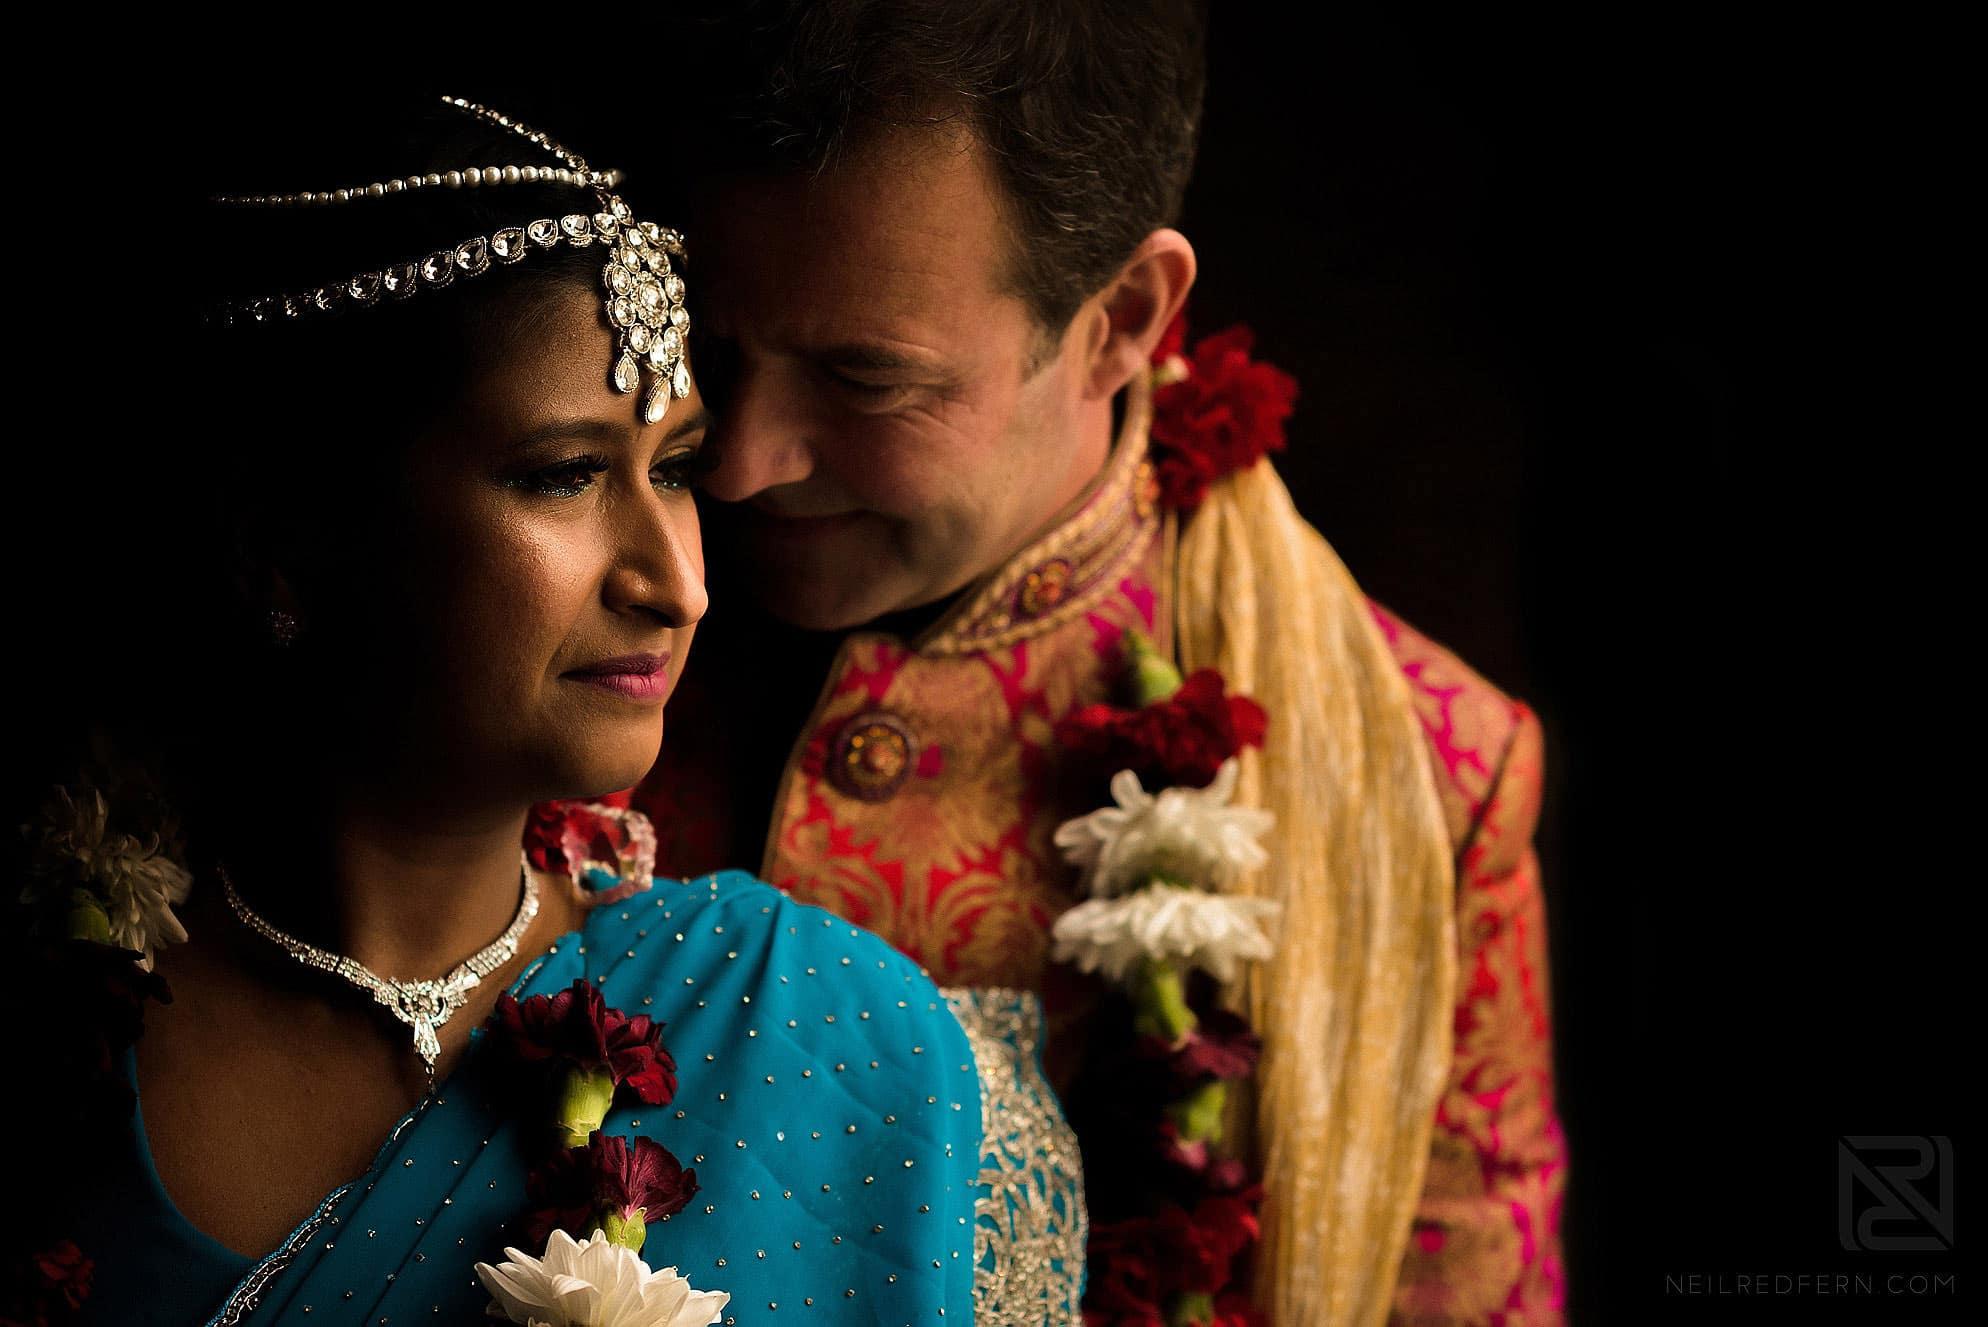 bride and groom portrait at Hindu wedding